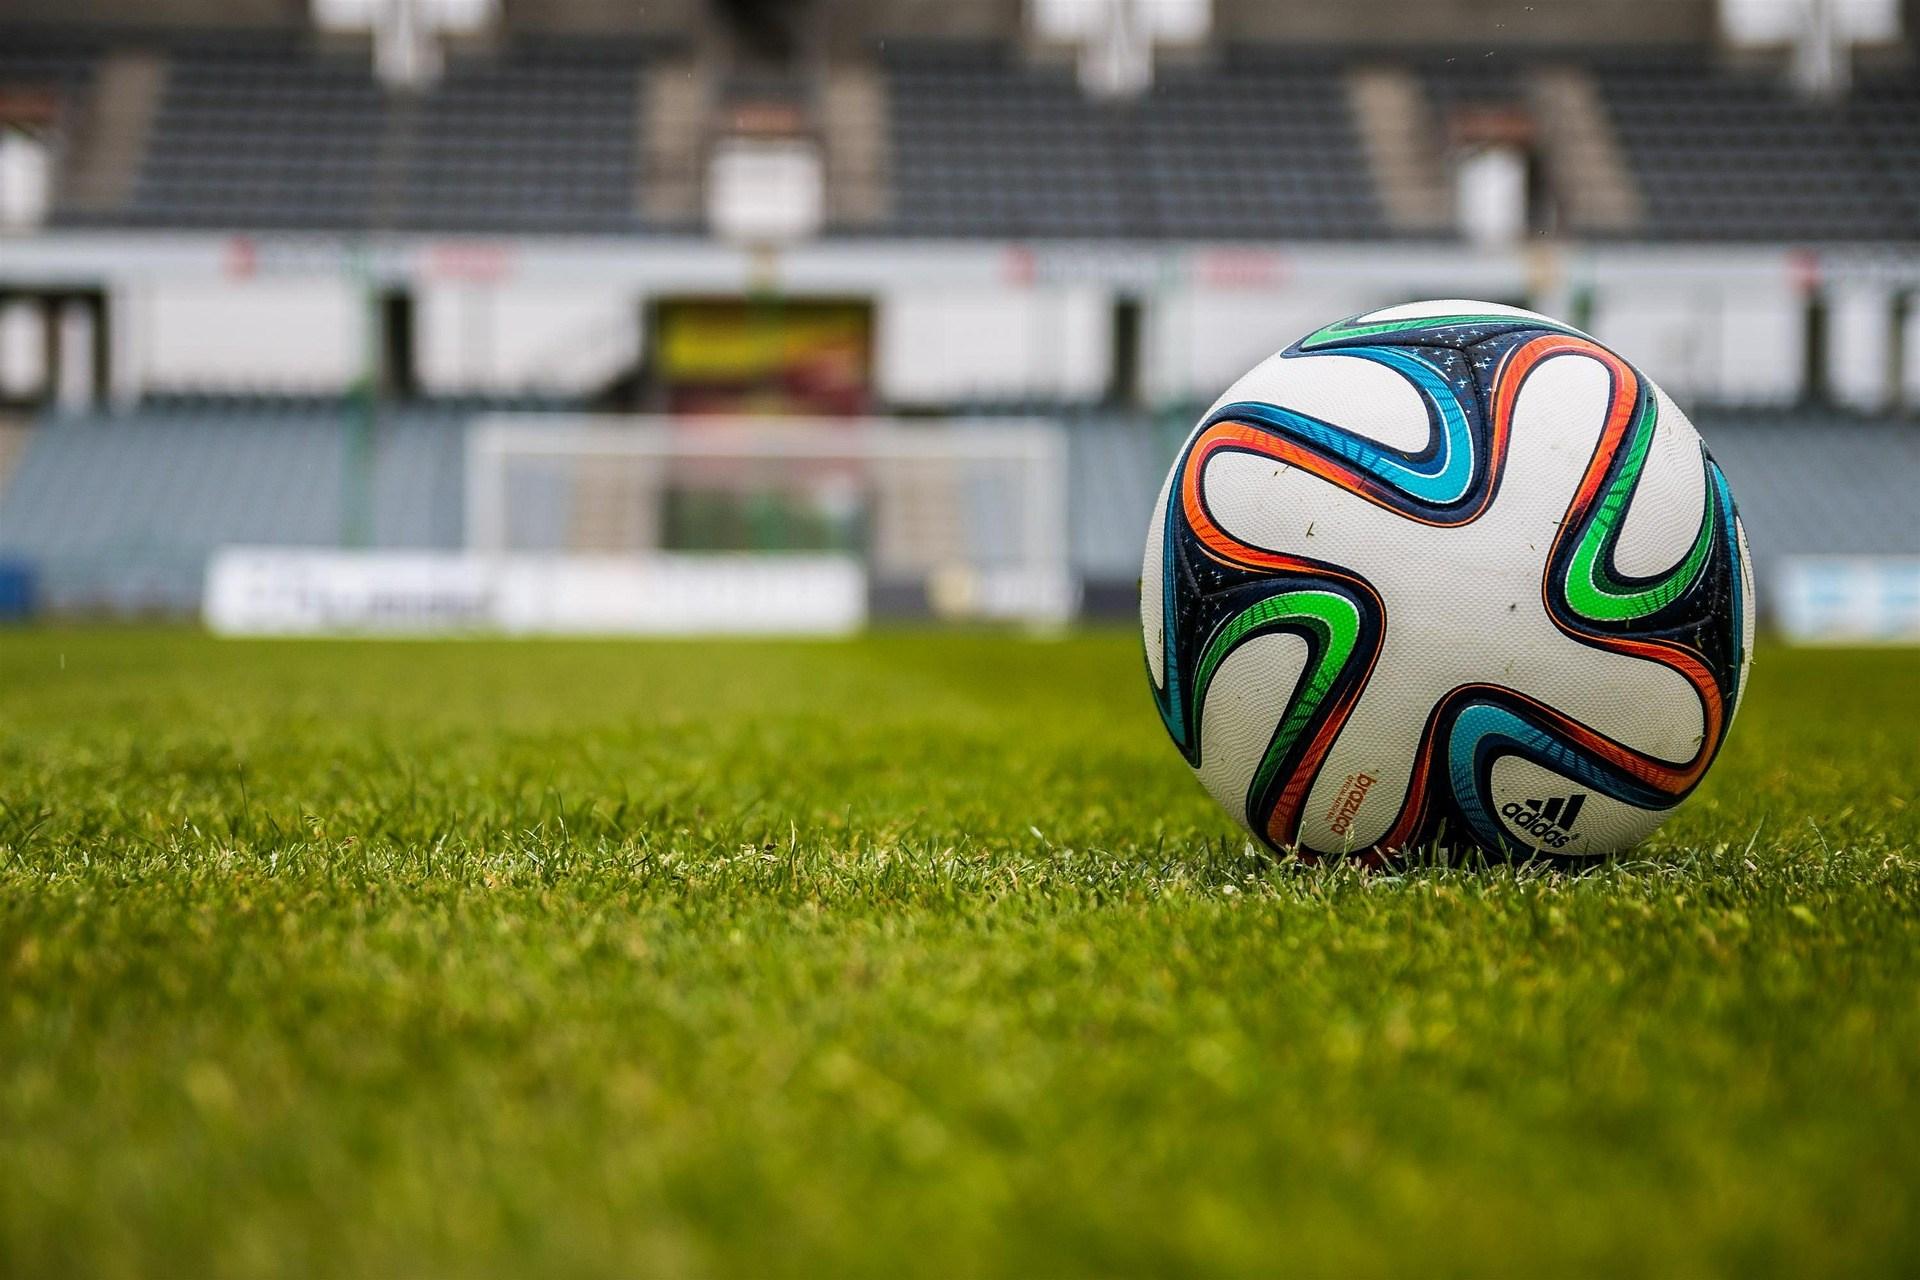 Newport County v Tranmere Rovers (Football League)